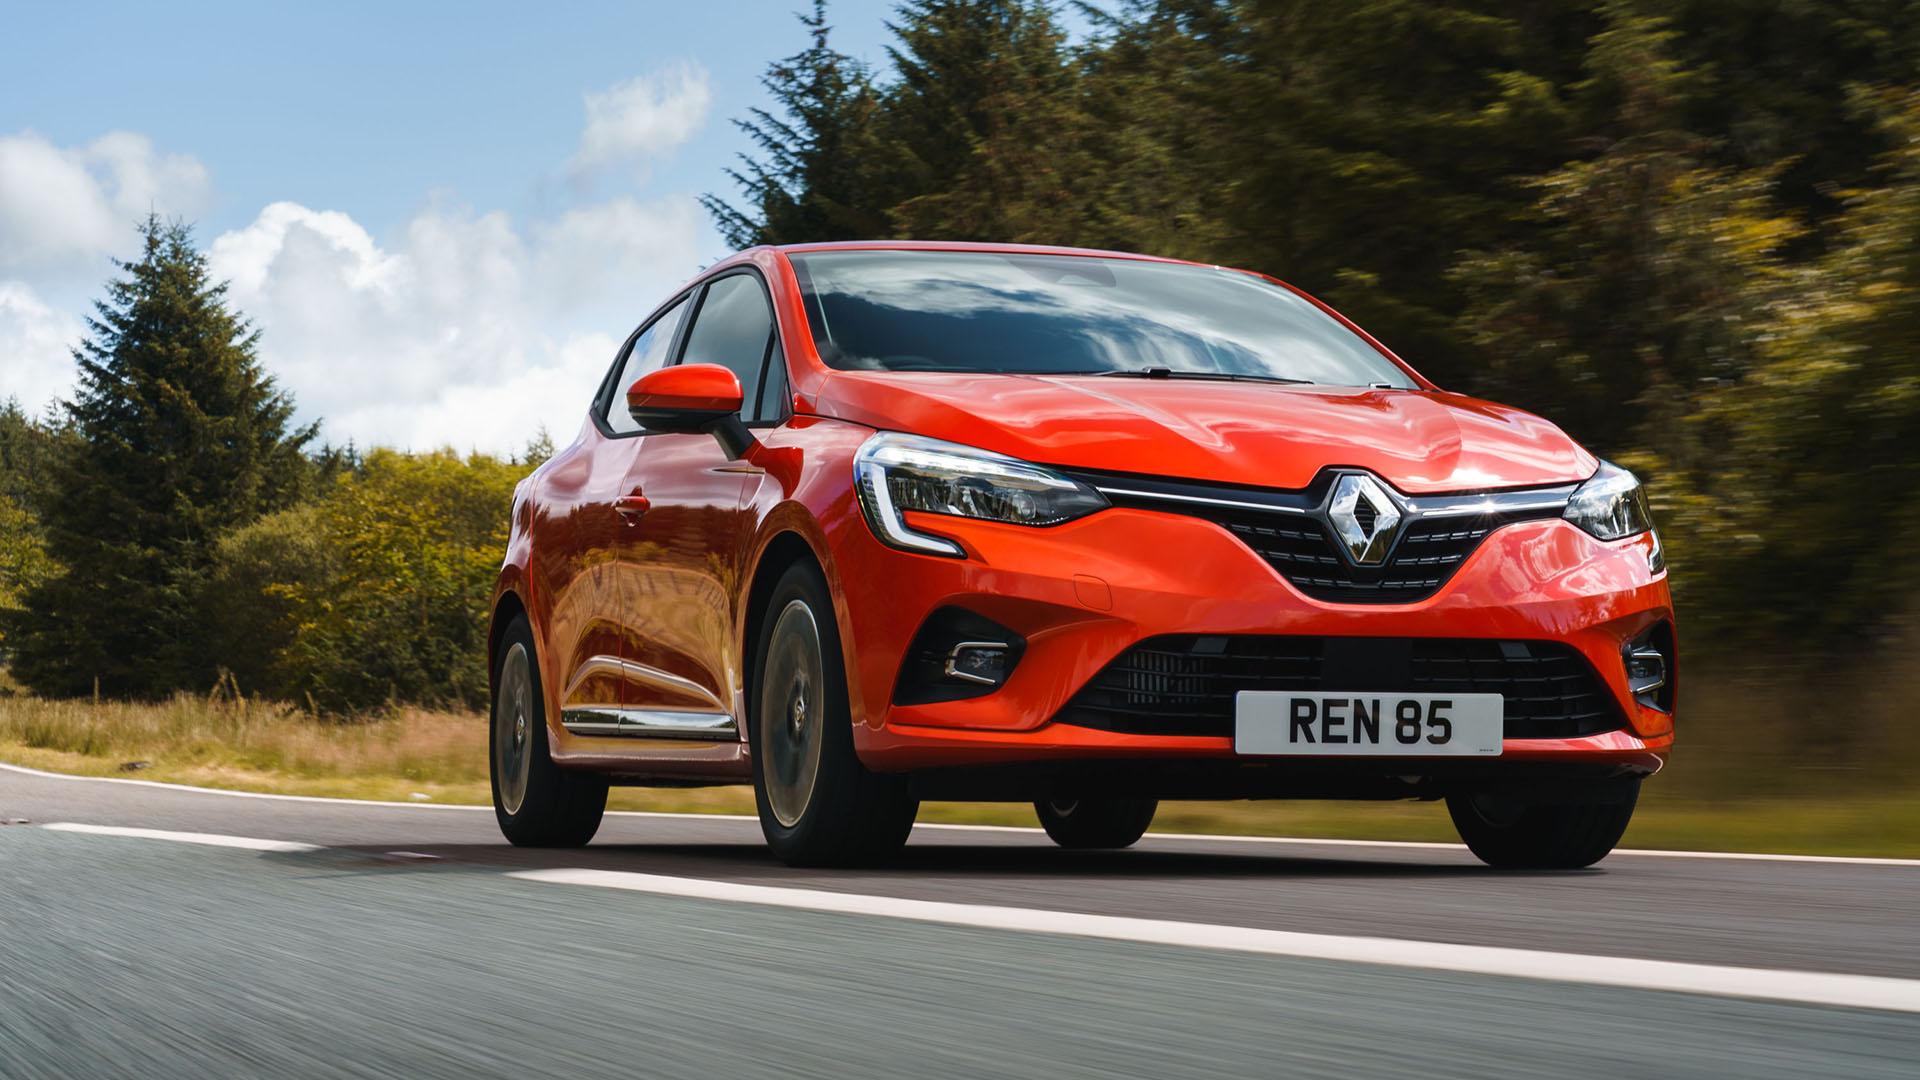 Renault: Θέλει να μειώσει την τελική ταχύτητα των αυτοκινήτων της για λόγους ασφάλειας